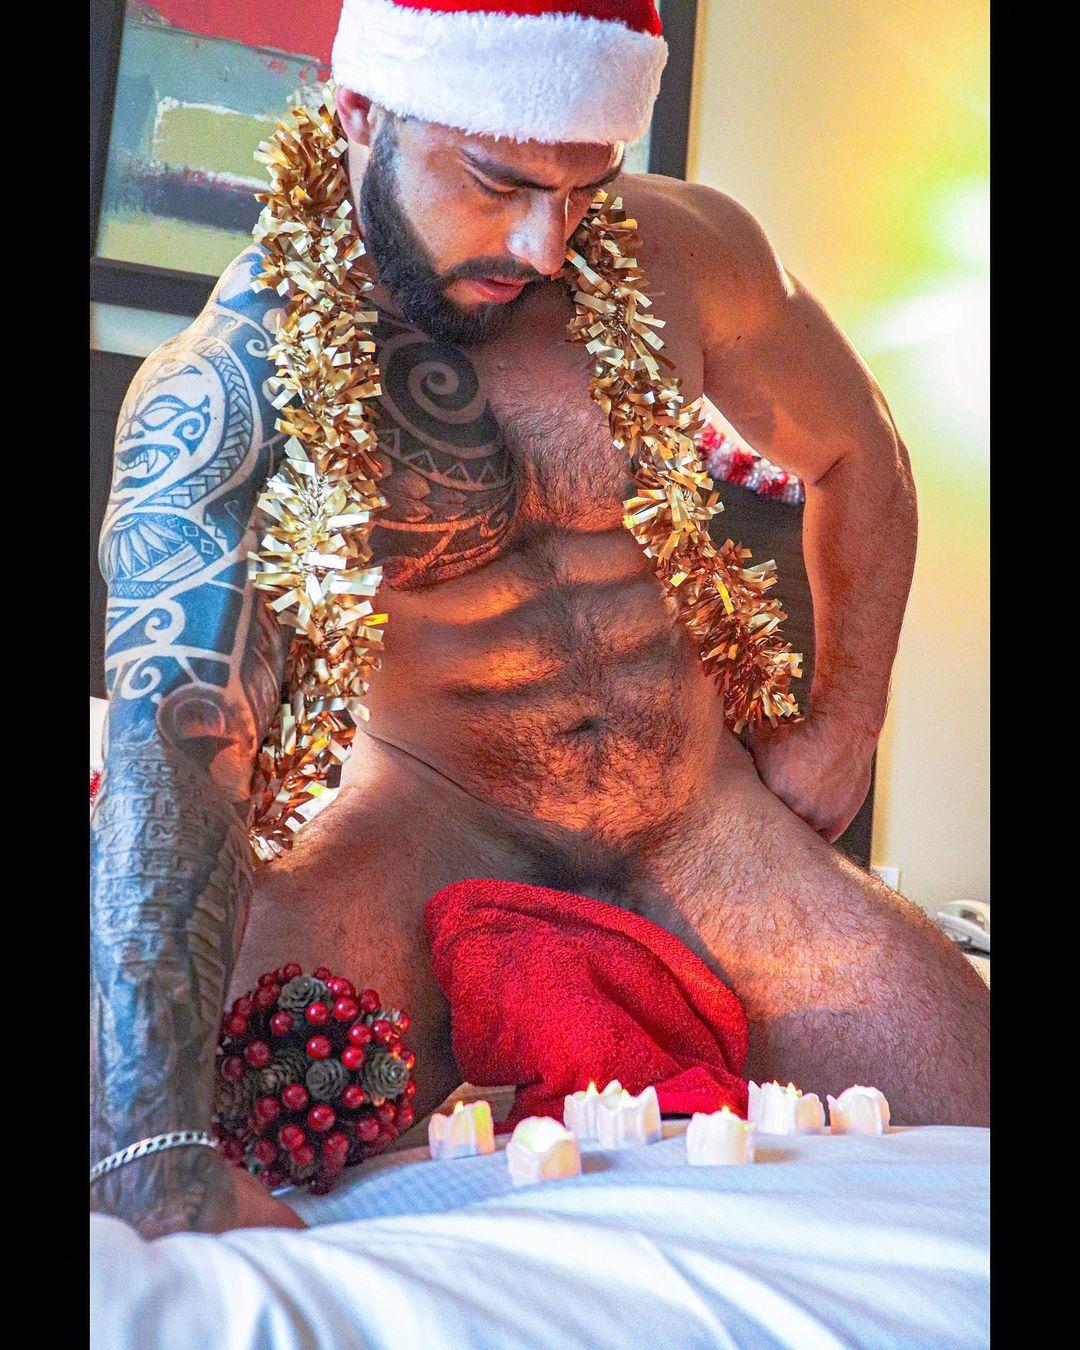 navidad cargada de sexo